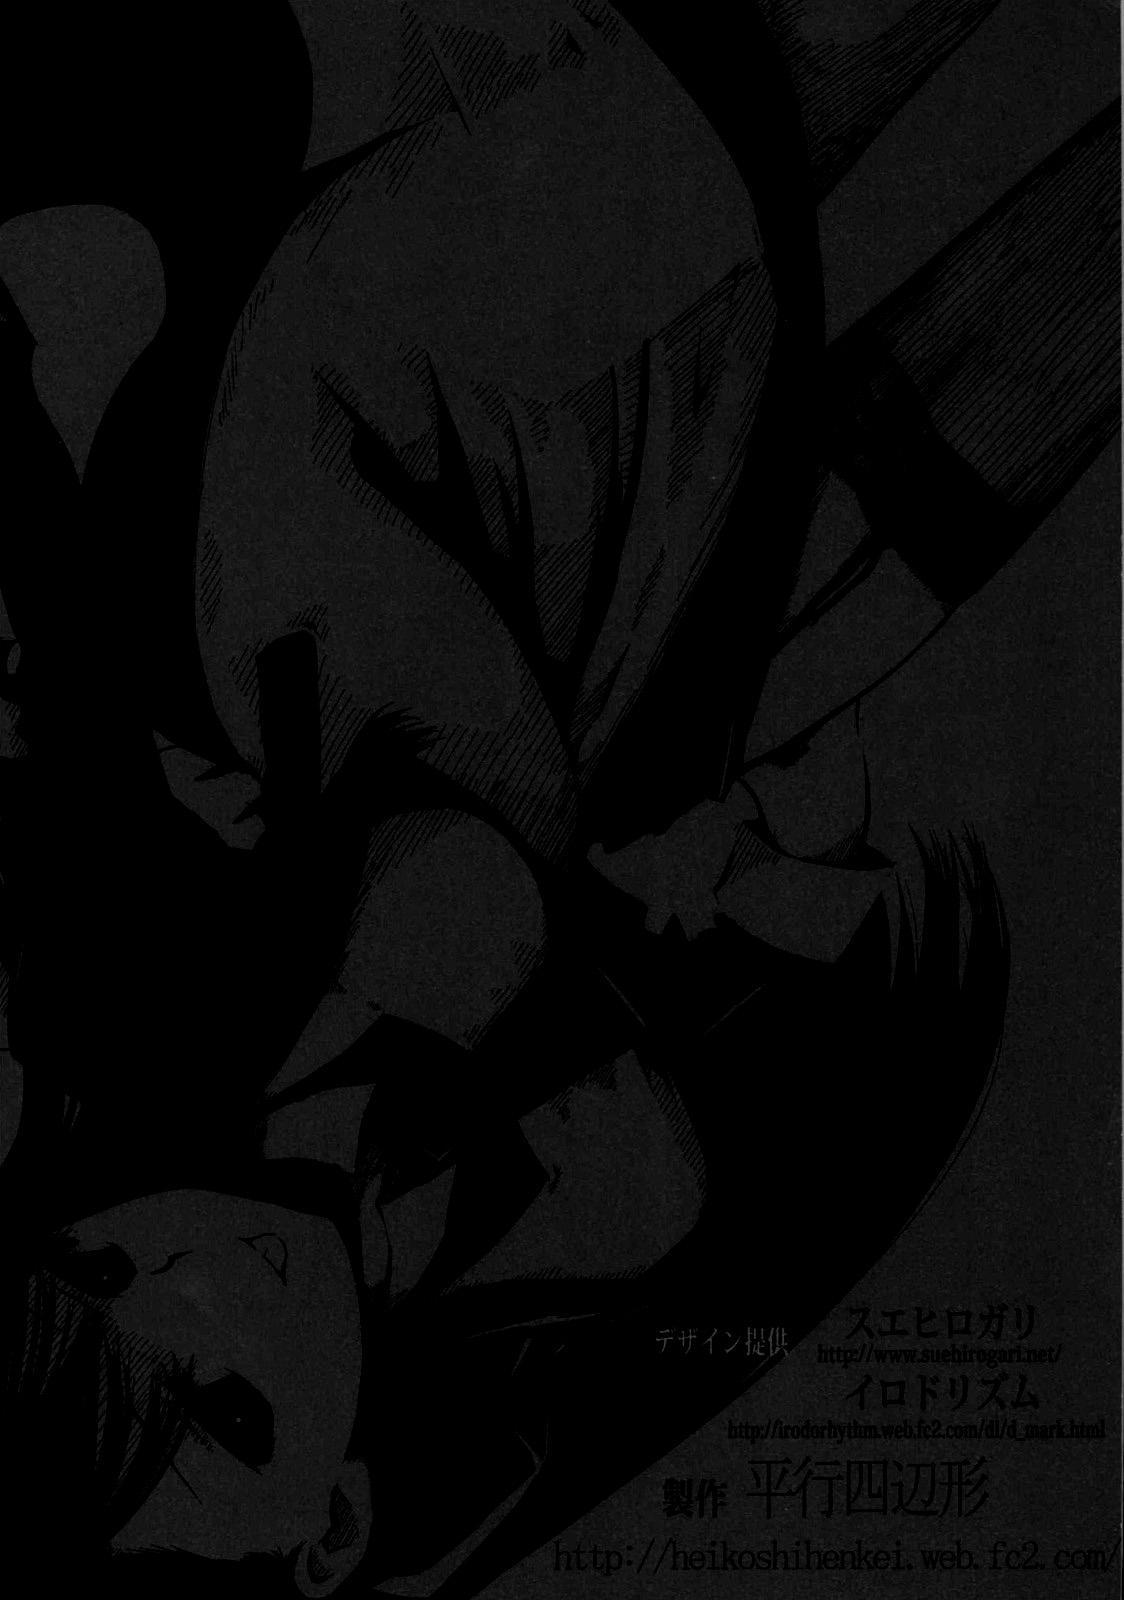 [Heikoushihenkei (Kawanakajima)] Akui-san ga Kaze hi-ta 1 [Chinese] [lolipoi汉化组] [2014-06-10] 44